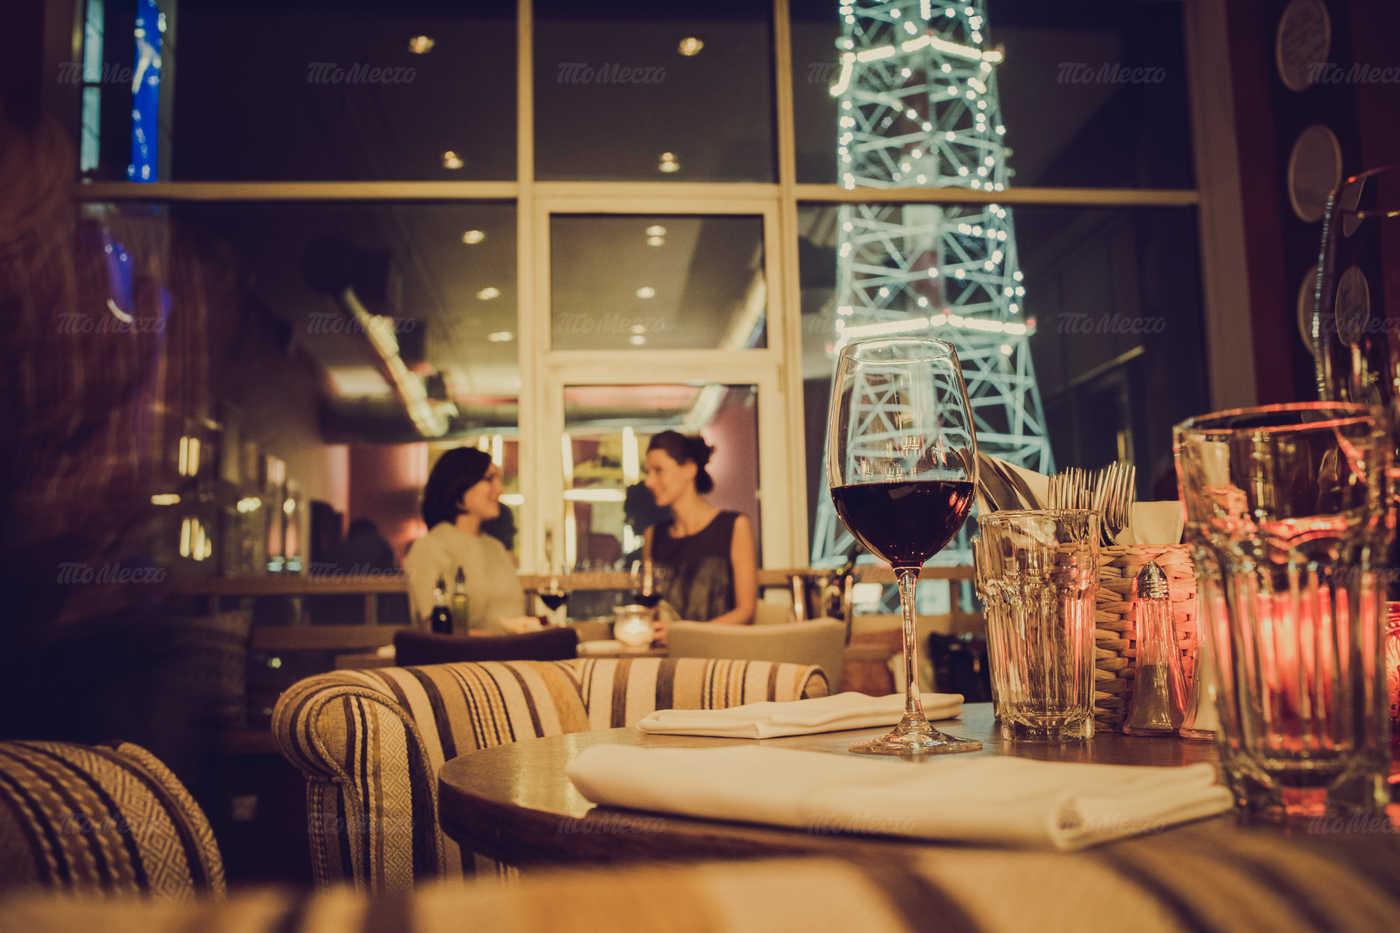 Меню ресторана Rыба (Рыба) на улице Академика Павлова